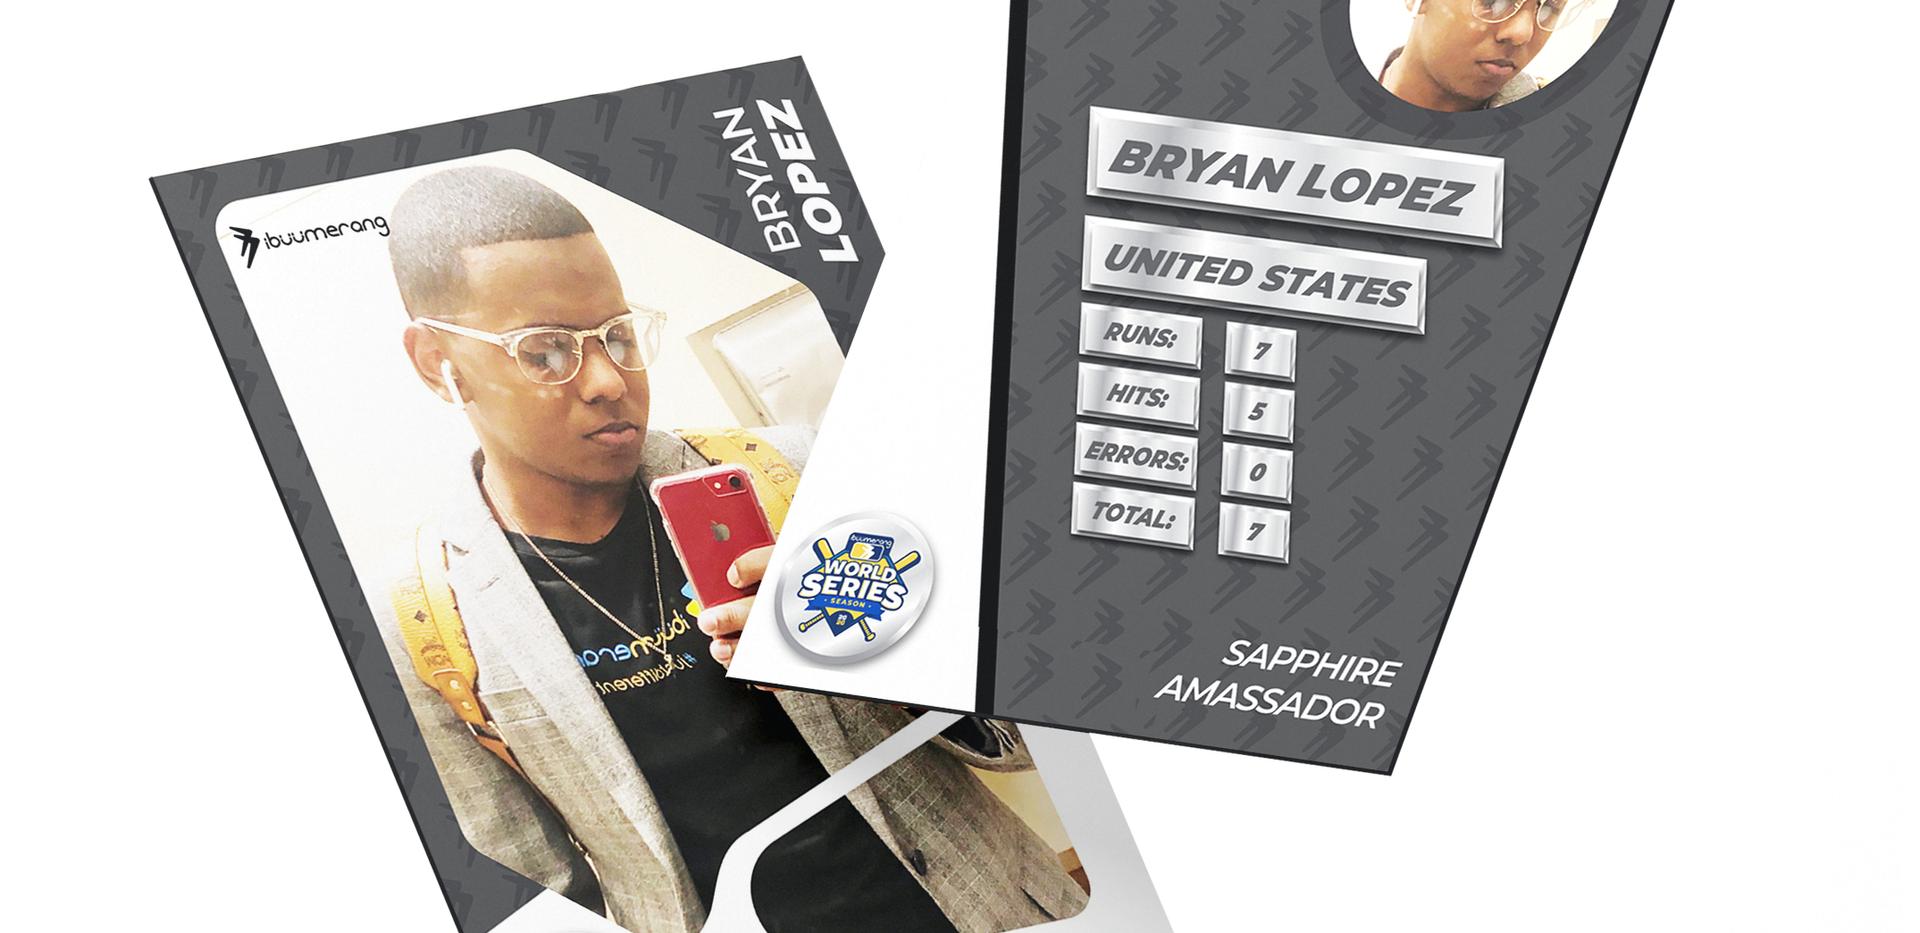 bryan-lopez-card.png